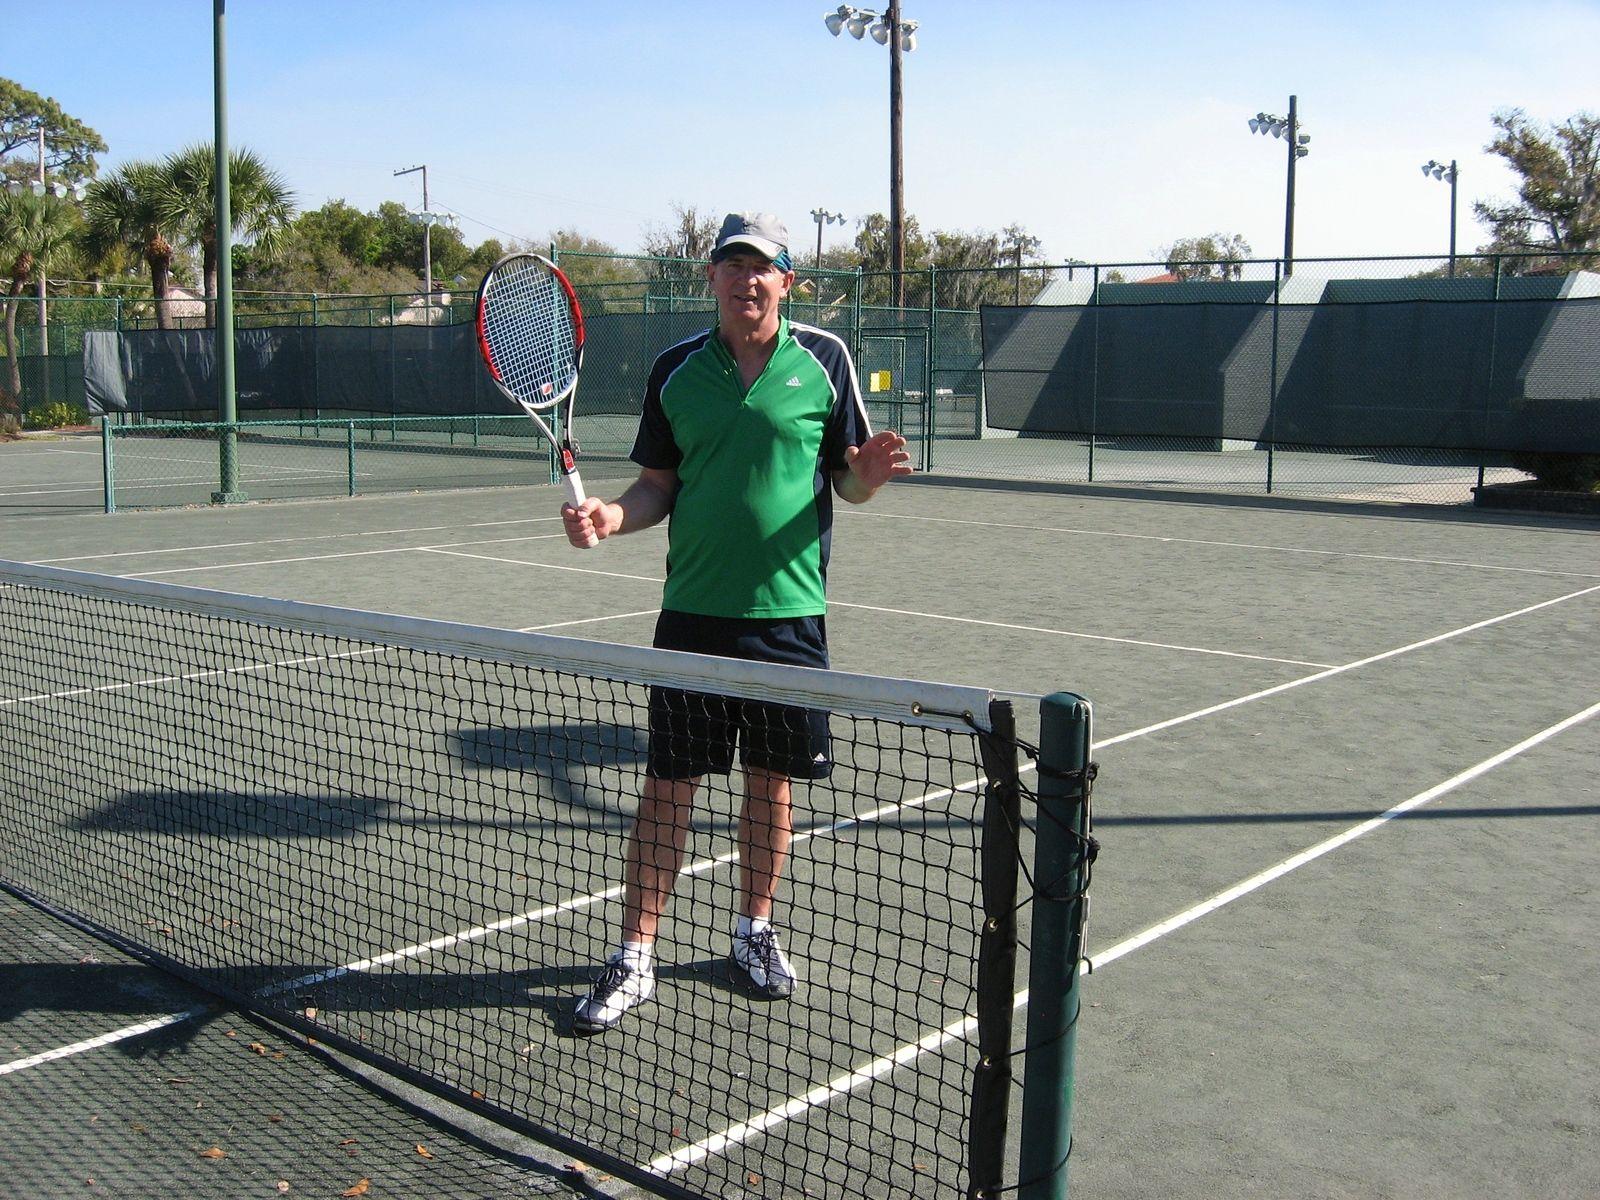 tennis-tourist-winter-park-florida-tennis-courts-key-west-teri-church